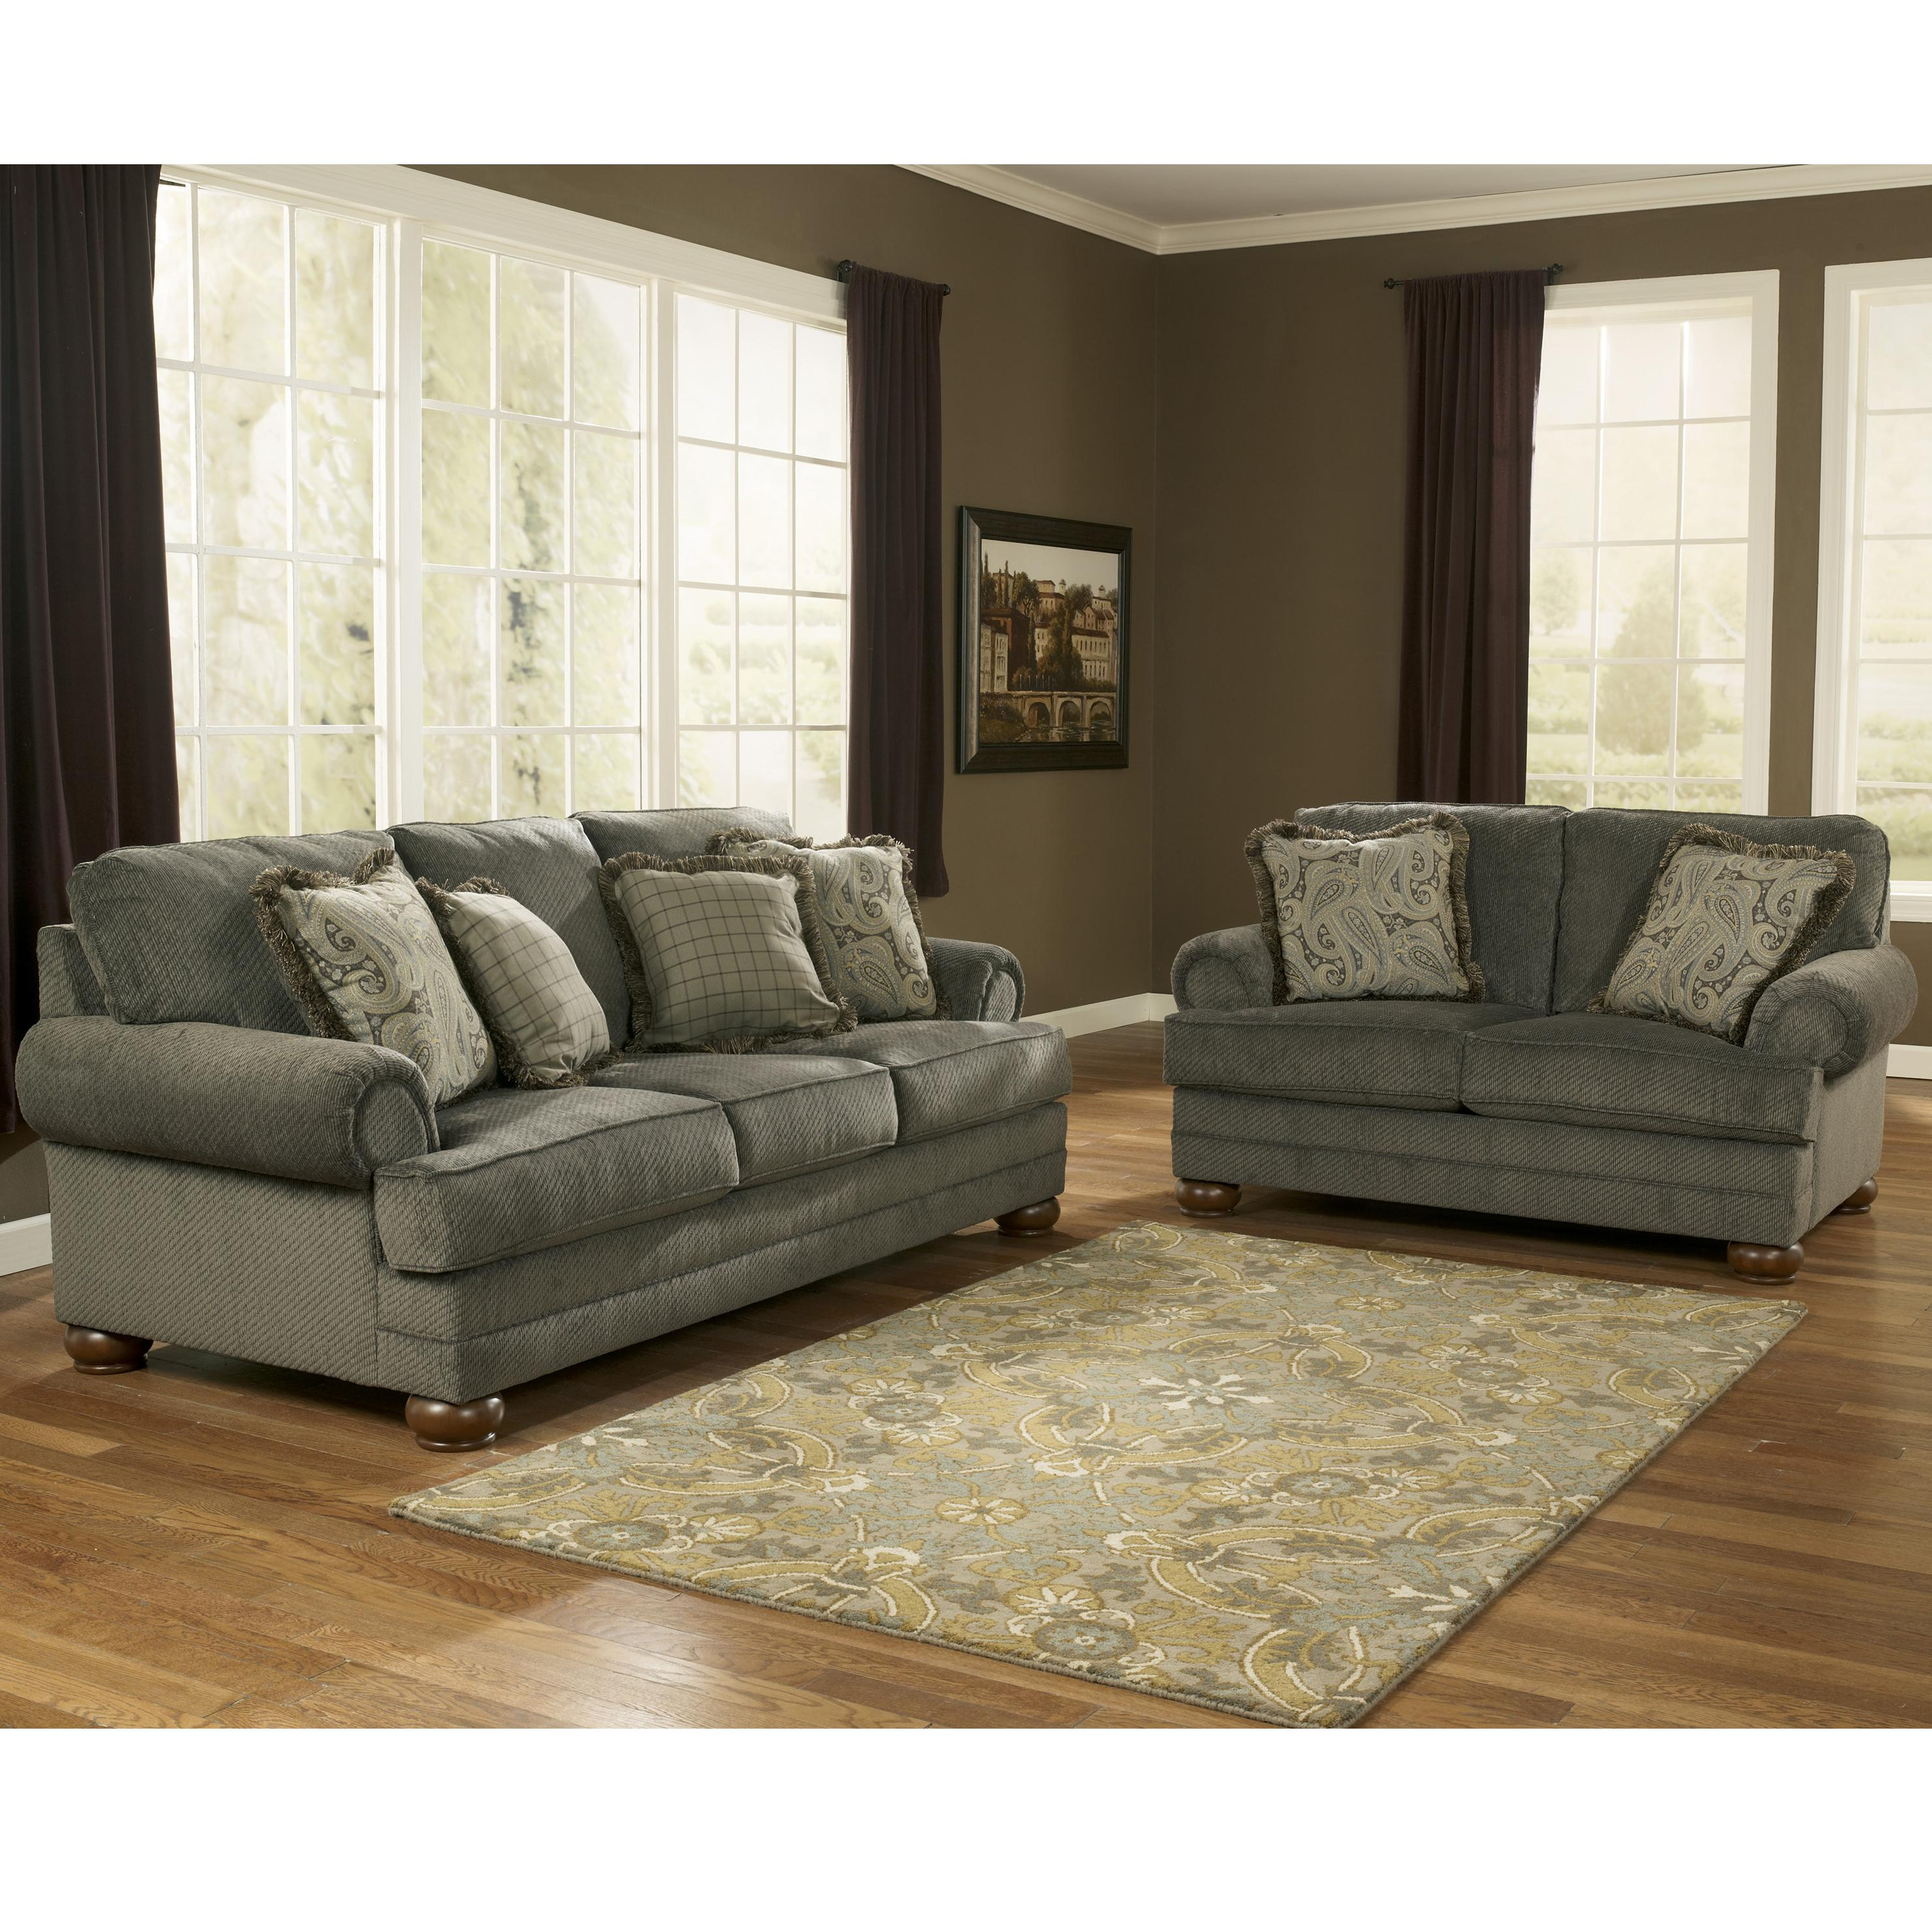 Signature Design by Ashley Parcal Estates - Basil Stationary Living Room Group - Item Number: 74005 Living Room Group 1